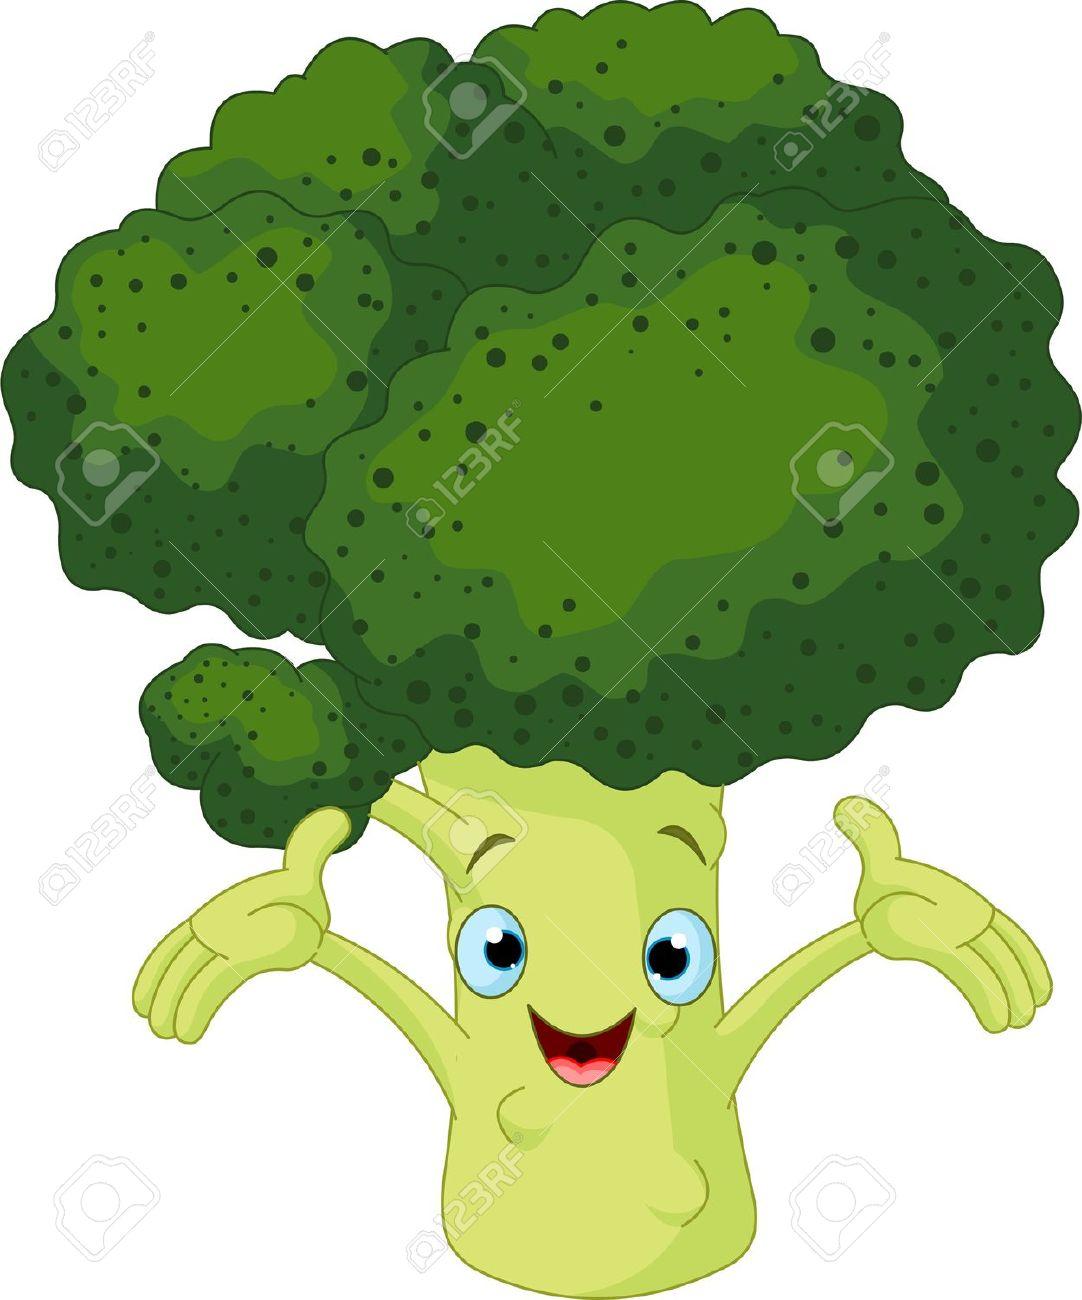 Cartoon Cute Broccoli Presenting Something Royalty Free Cliparts.